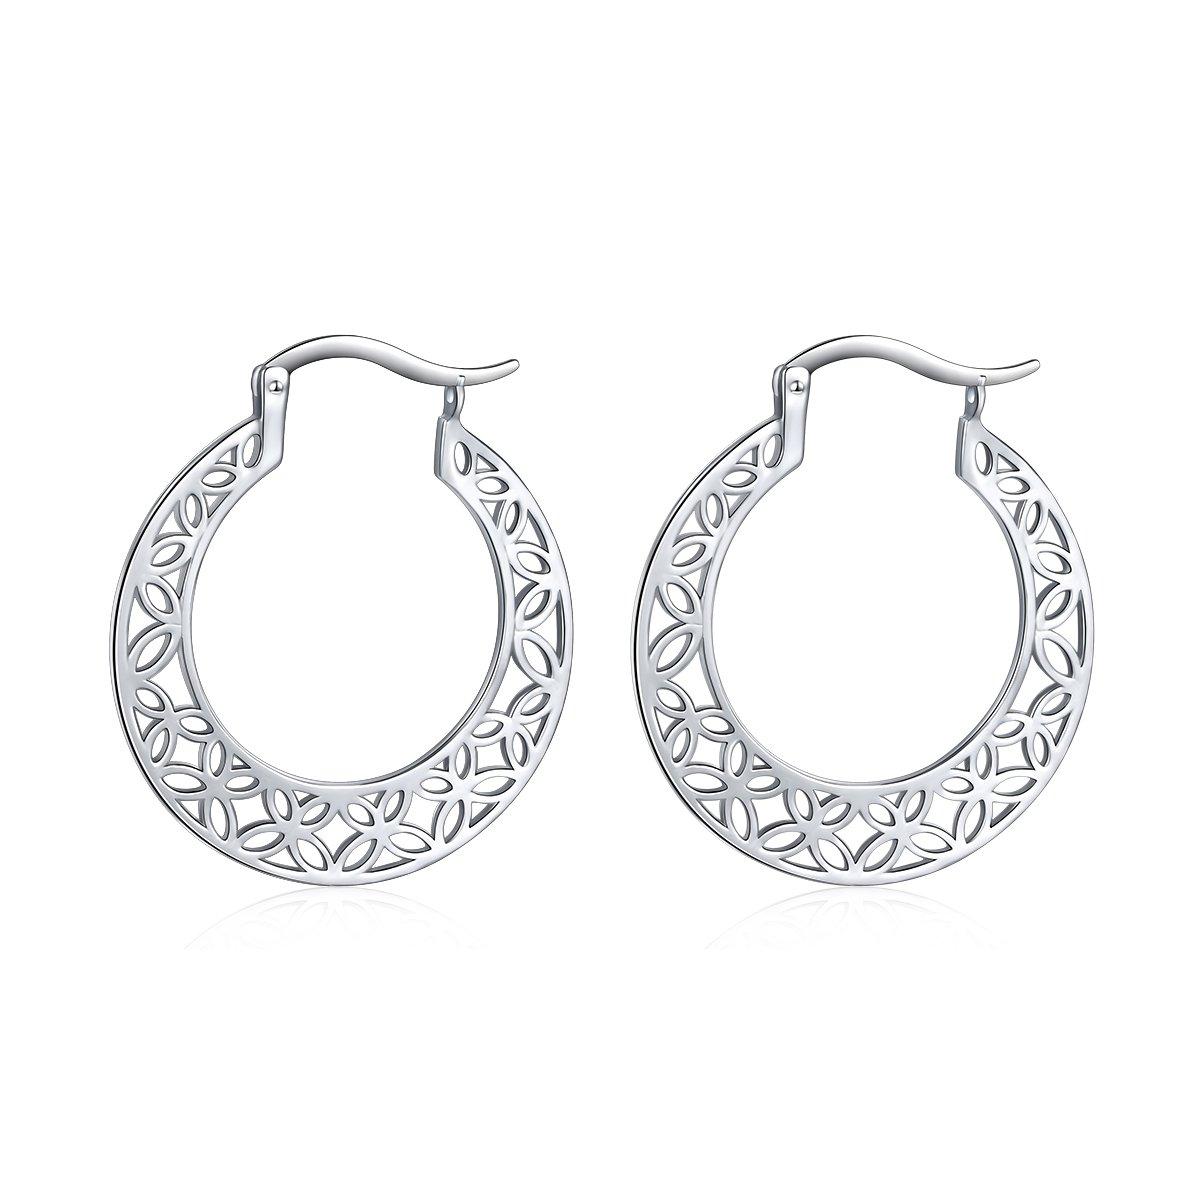 S925 Sterling Silver Filigree Hoop Earrings Round Dangle Earrings Click-Top for Women,30mm